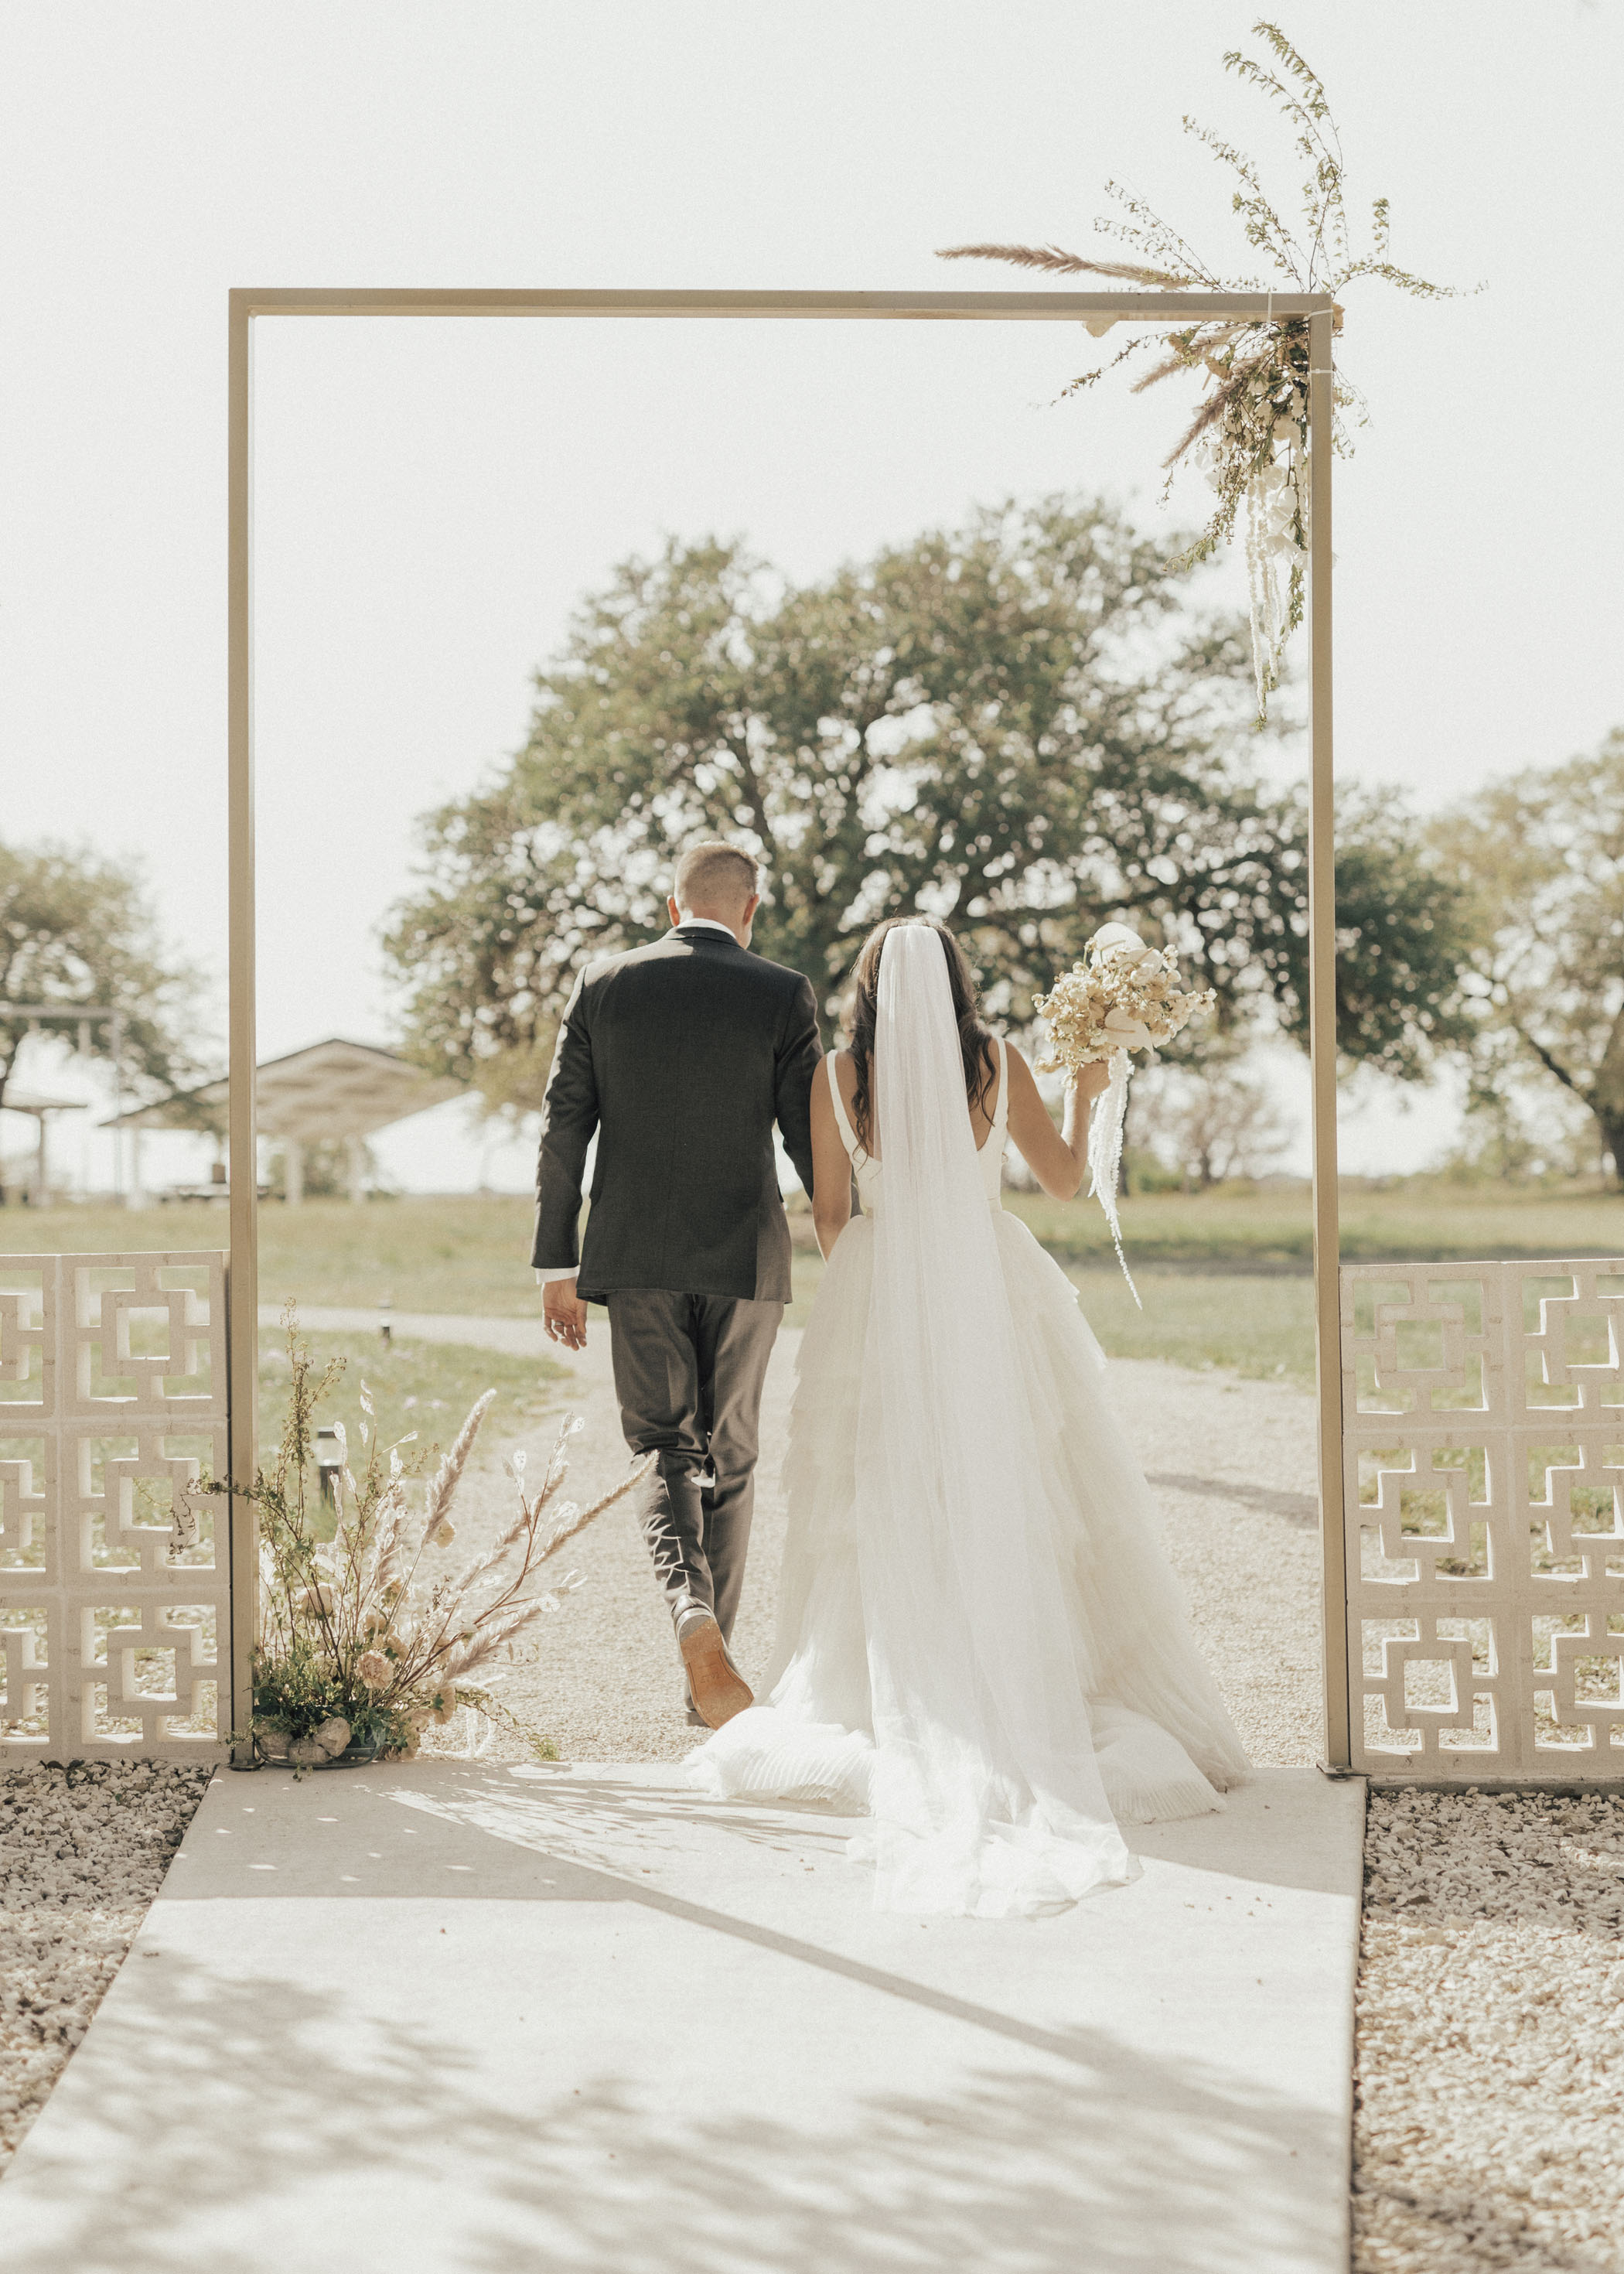 Texas Barn Wedding with Neutrals